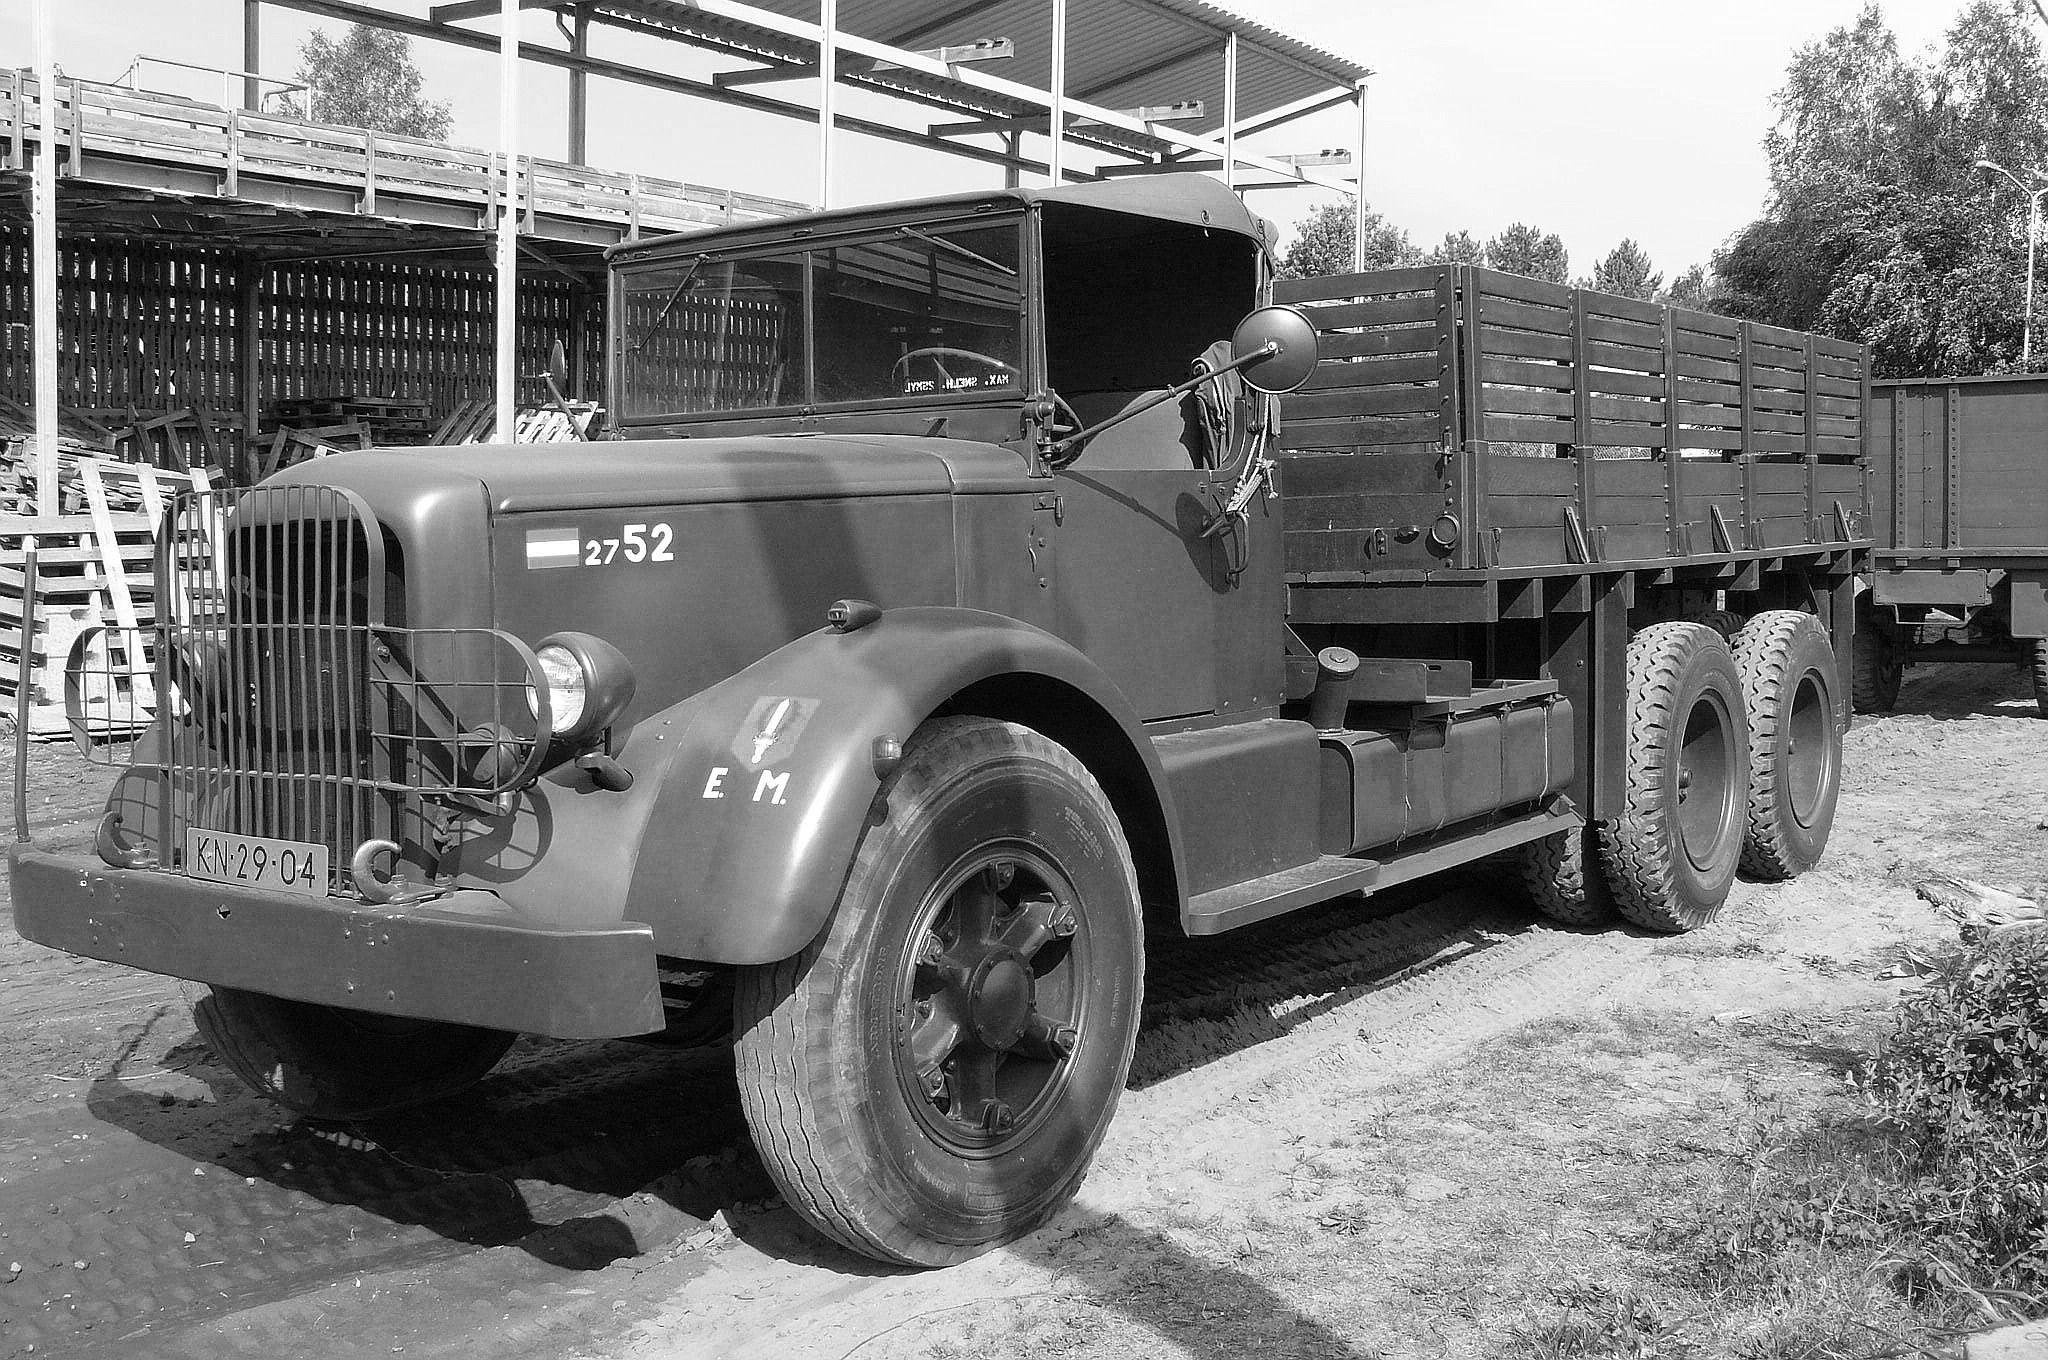 Pin By Gernot Leins On Mack Trucks Pinterest Mack Trucks